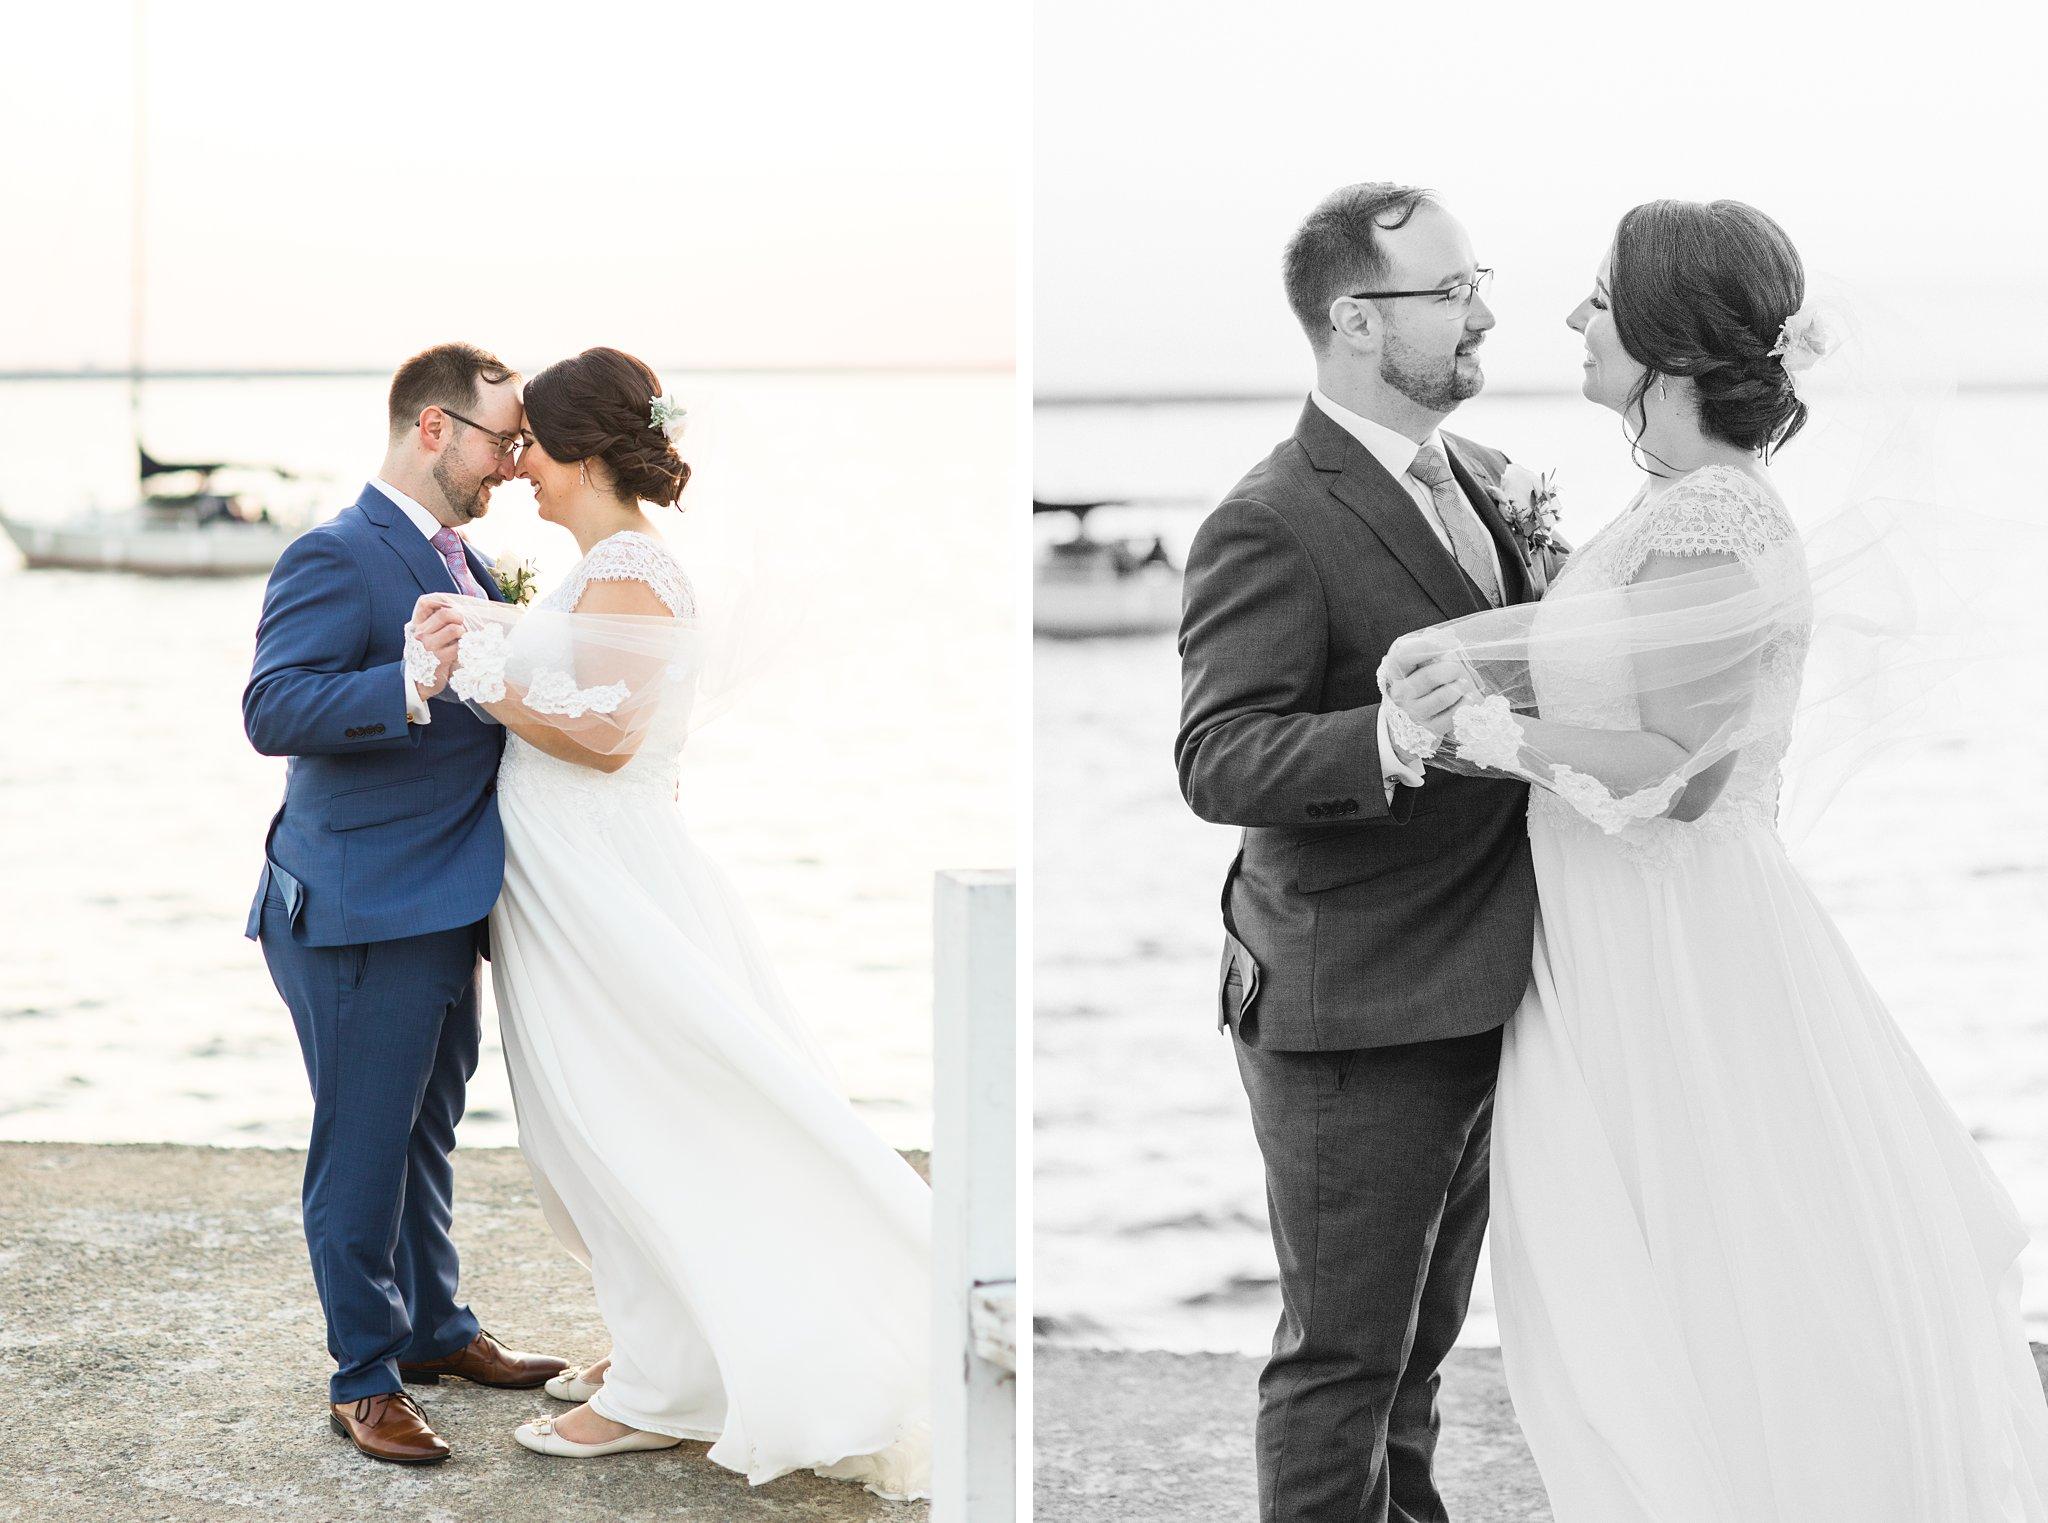 Sunset photos on Ottawa river, Britannia Yacht Club Wedding Photos, Amy Pinder Photography